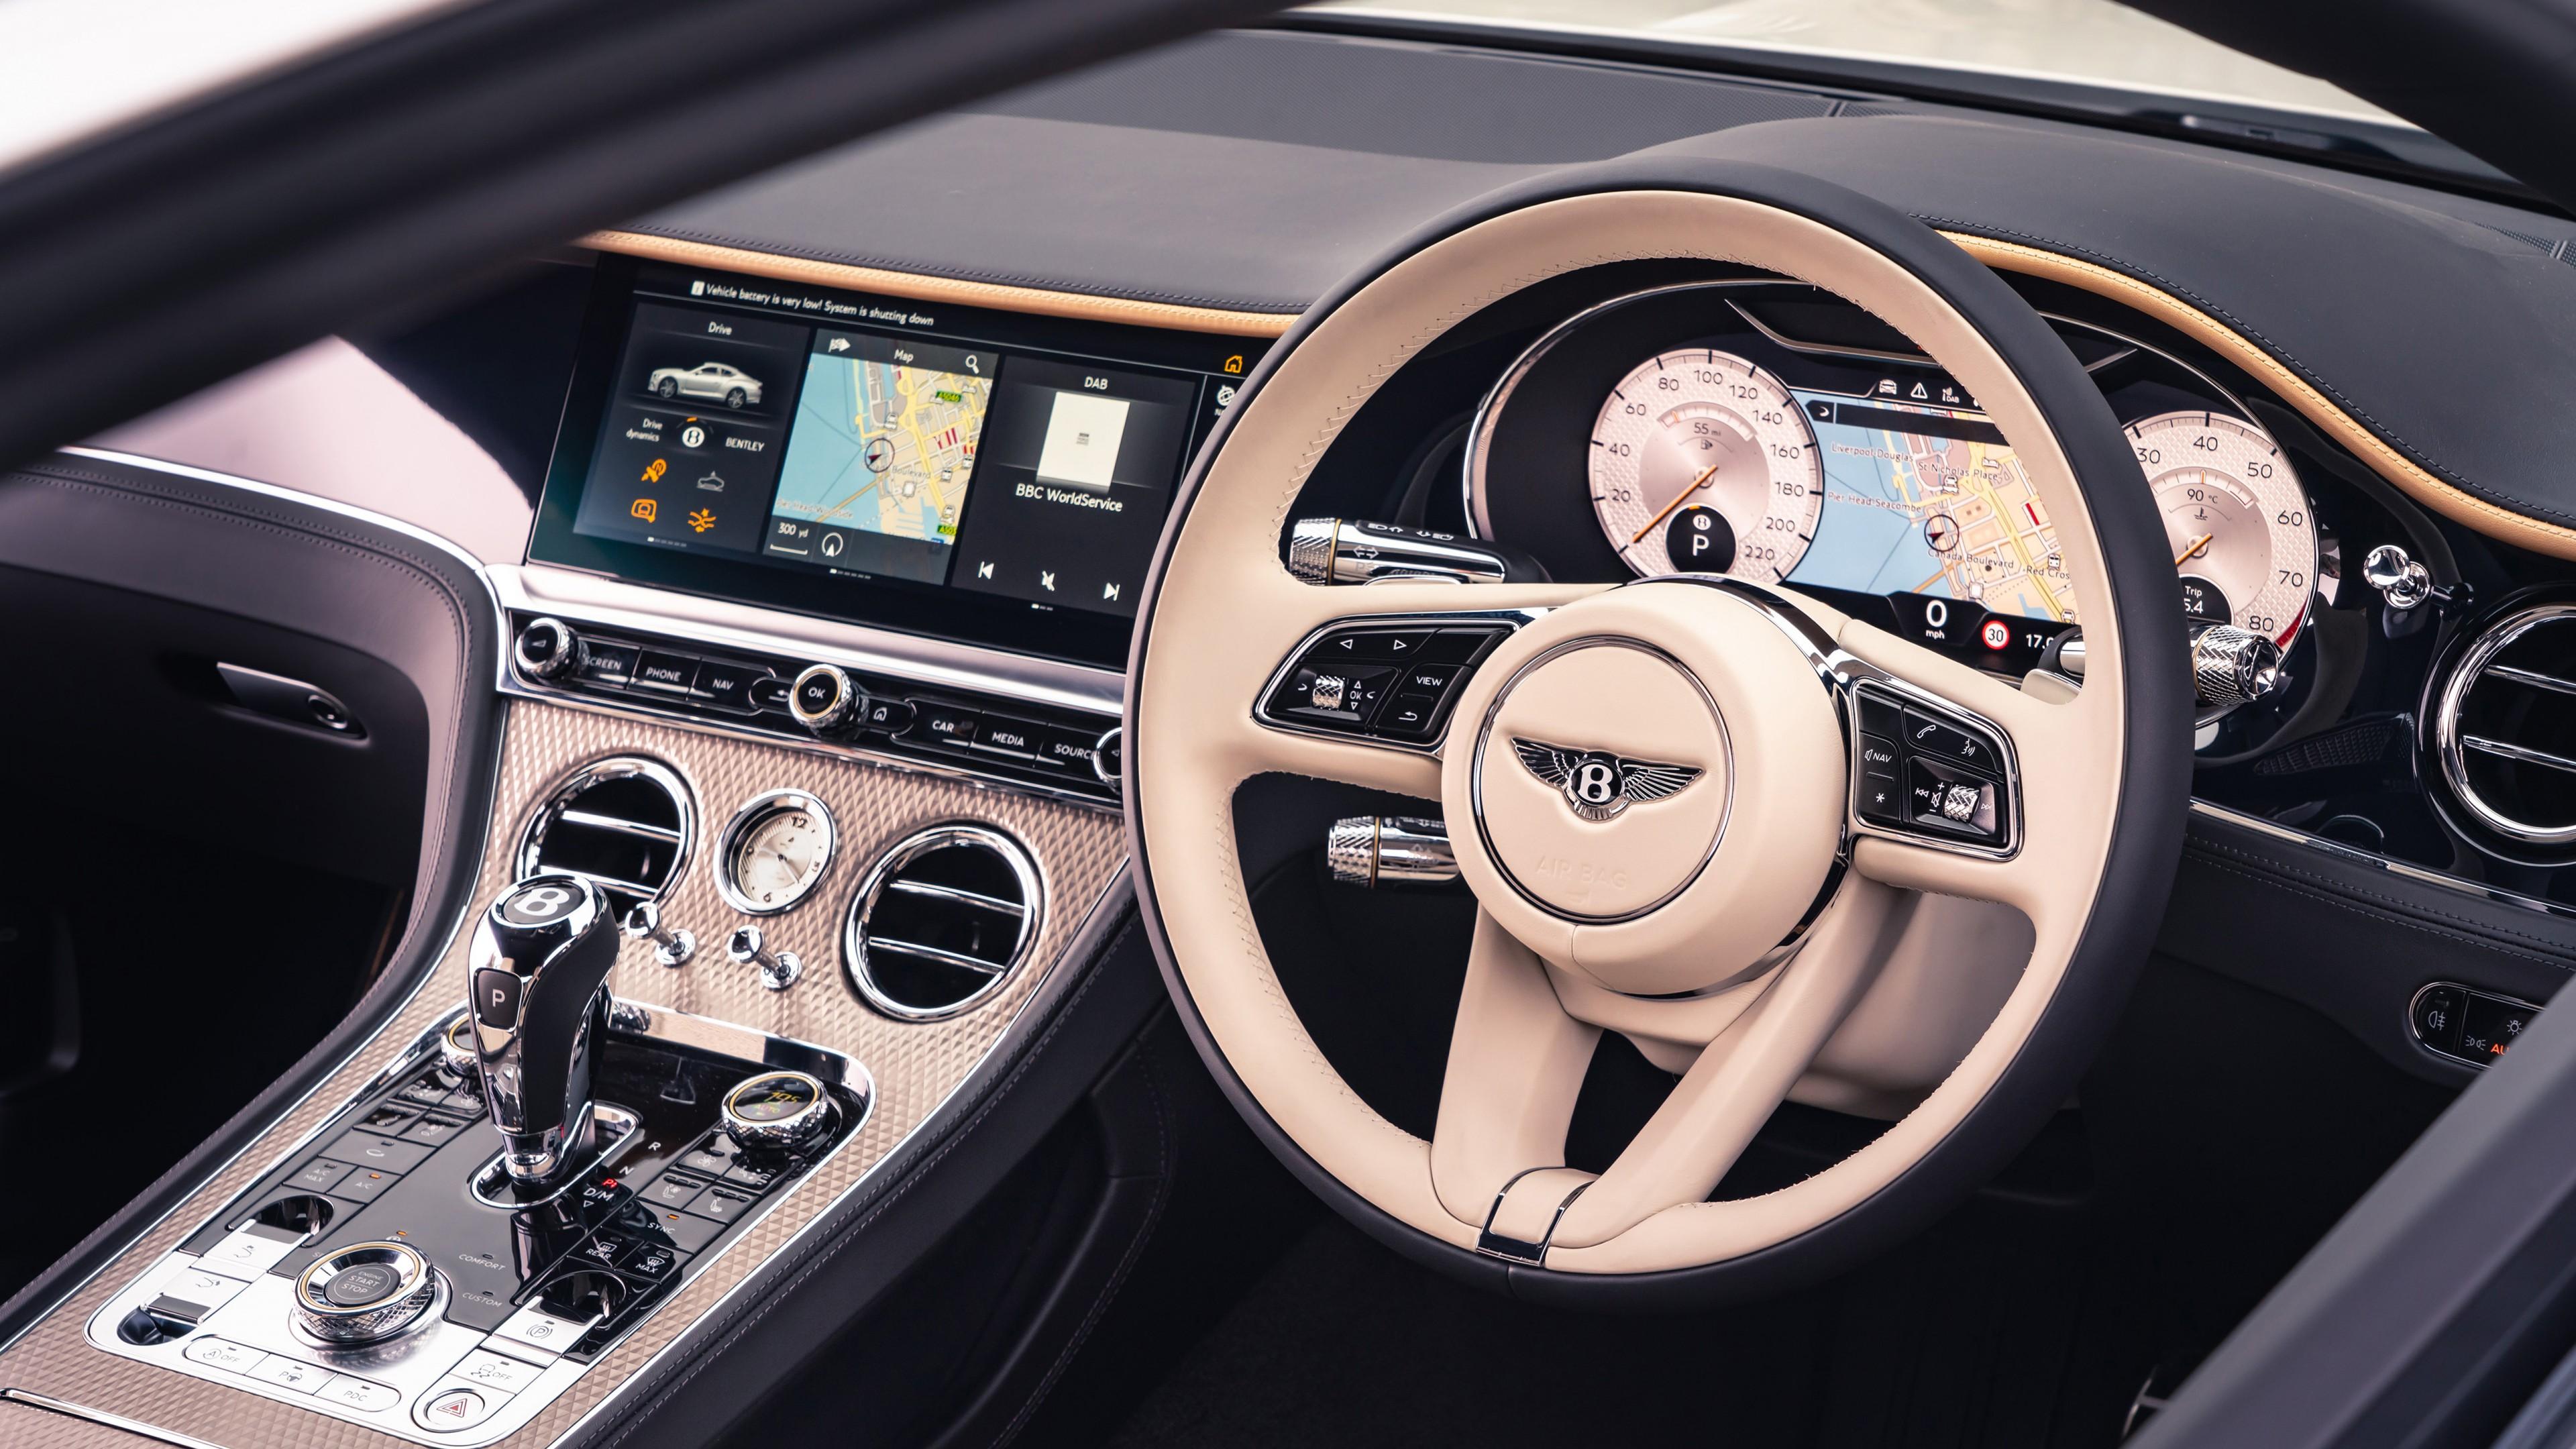 Bentley Continental Gt Mulliner 2020 5k Interior Wallpaper Hd Car Wallpapers Id 15781